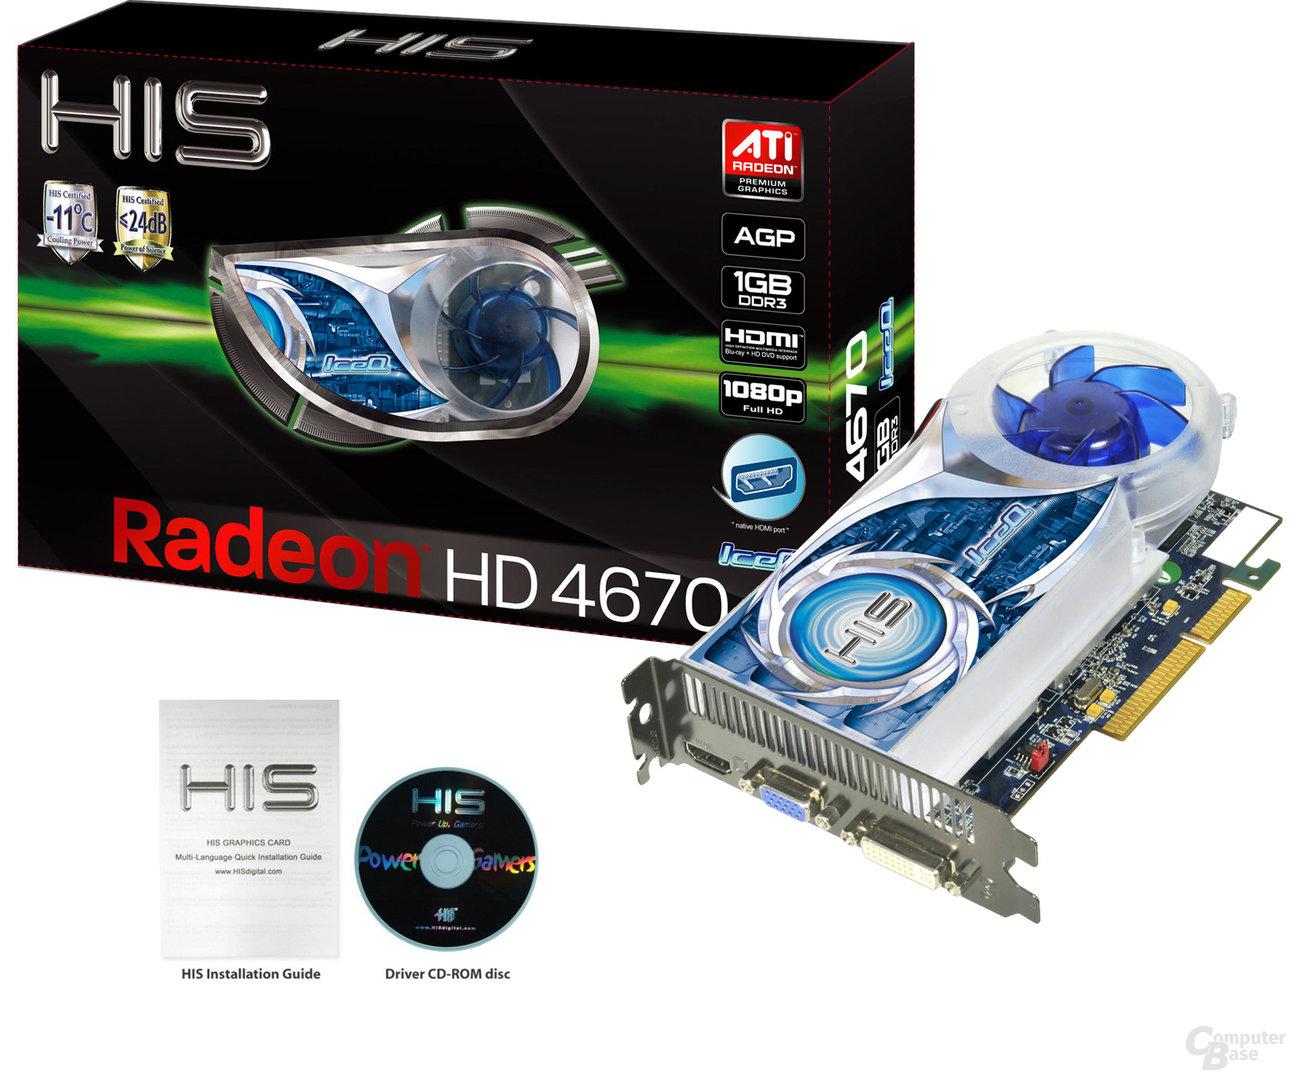 HIS Radeon HD 4670 AGP